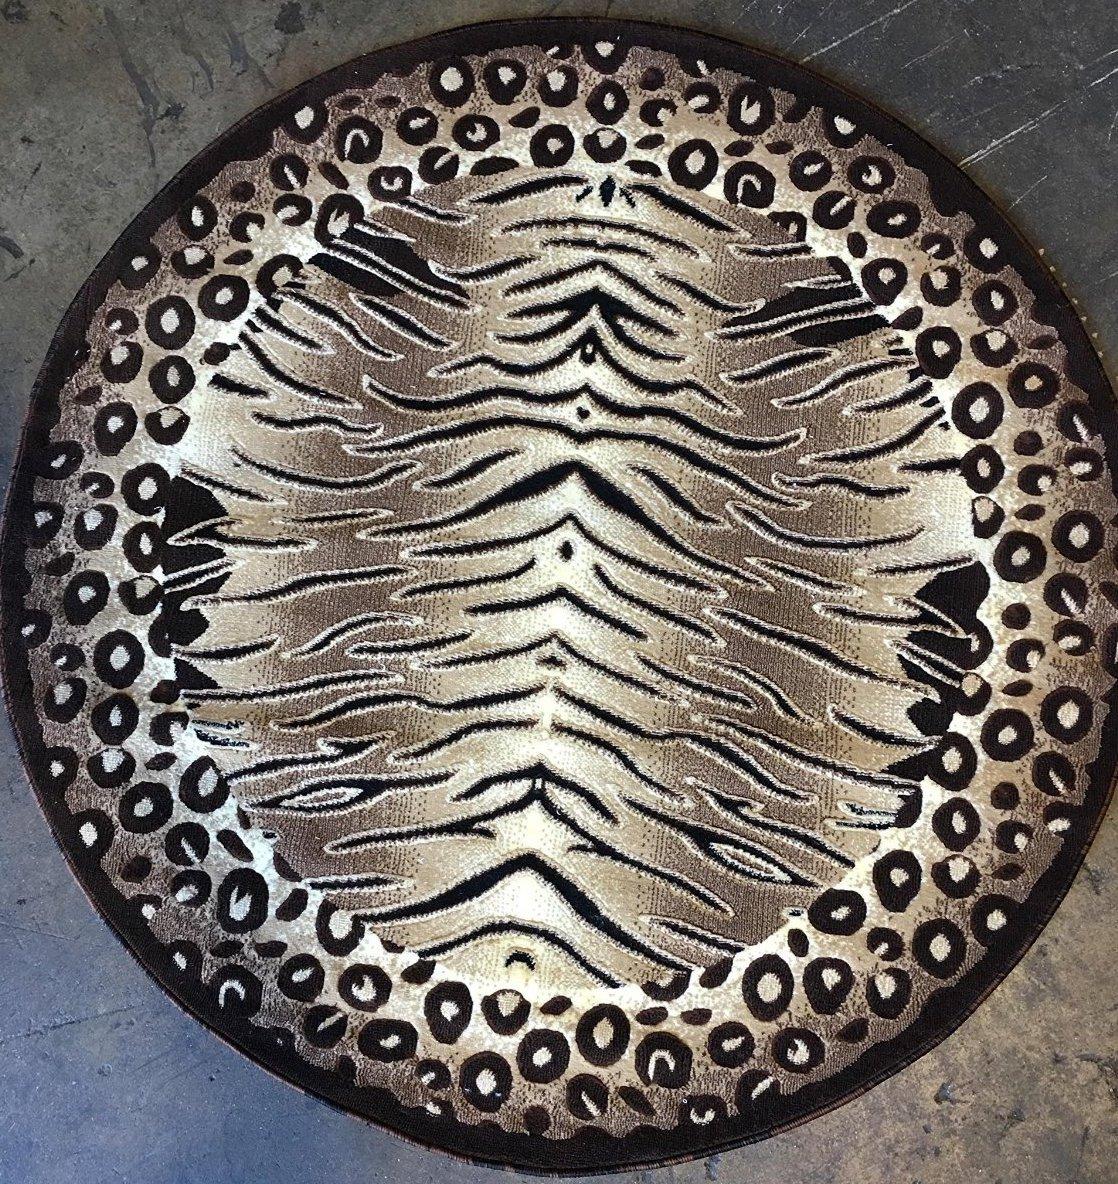 Americana Tiger & Leopard Zebra Animal Skin Round Area Rug Print Design 130 (4 feet X 4 feet Round)